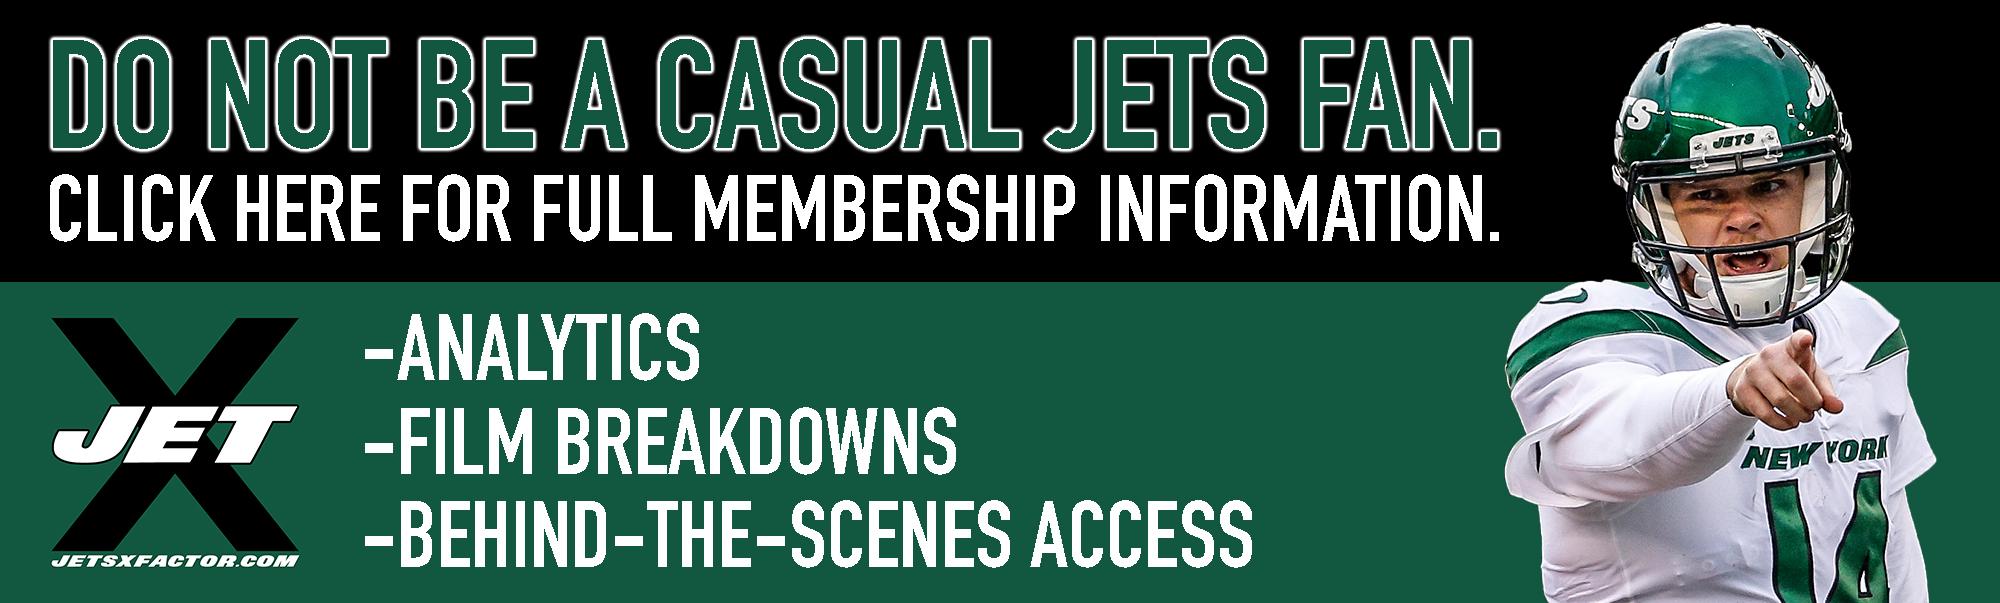 Jet X Membership